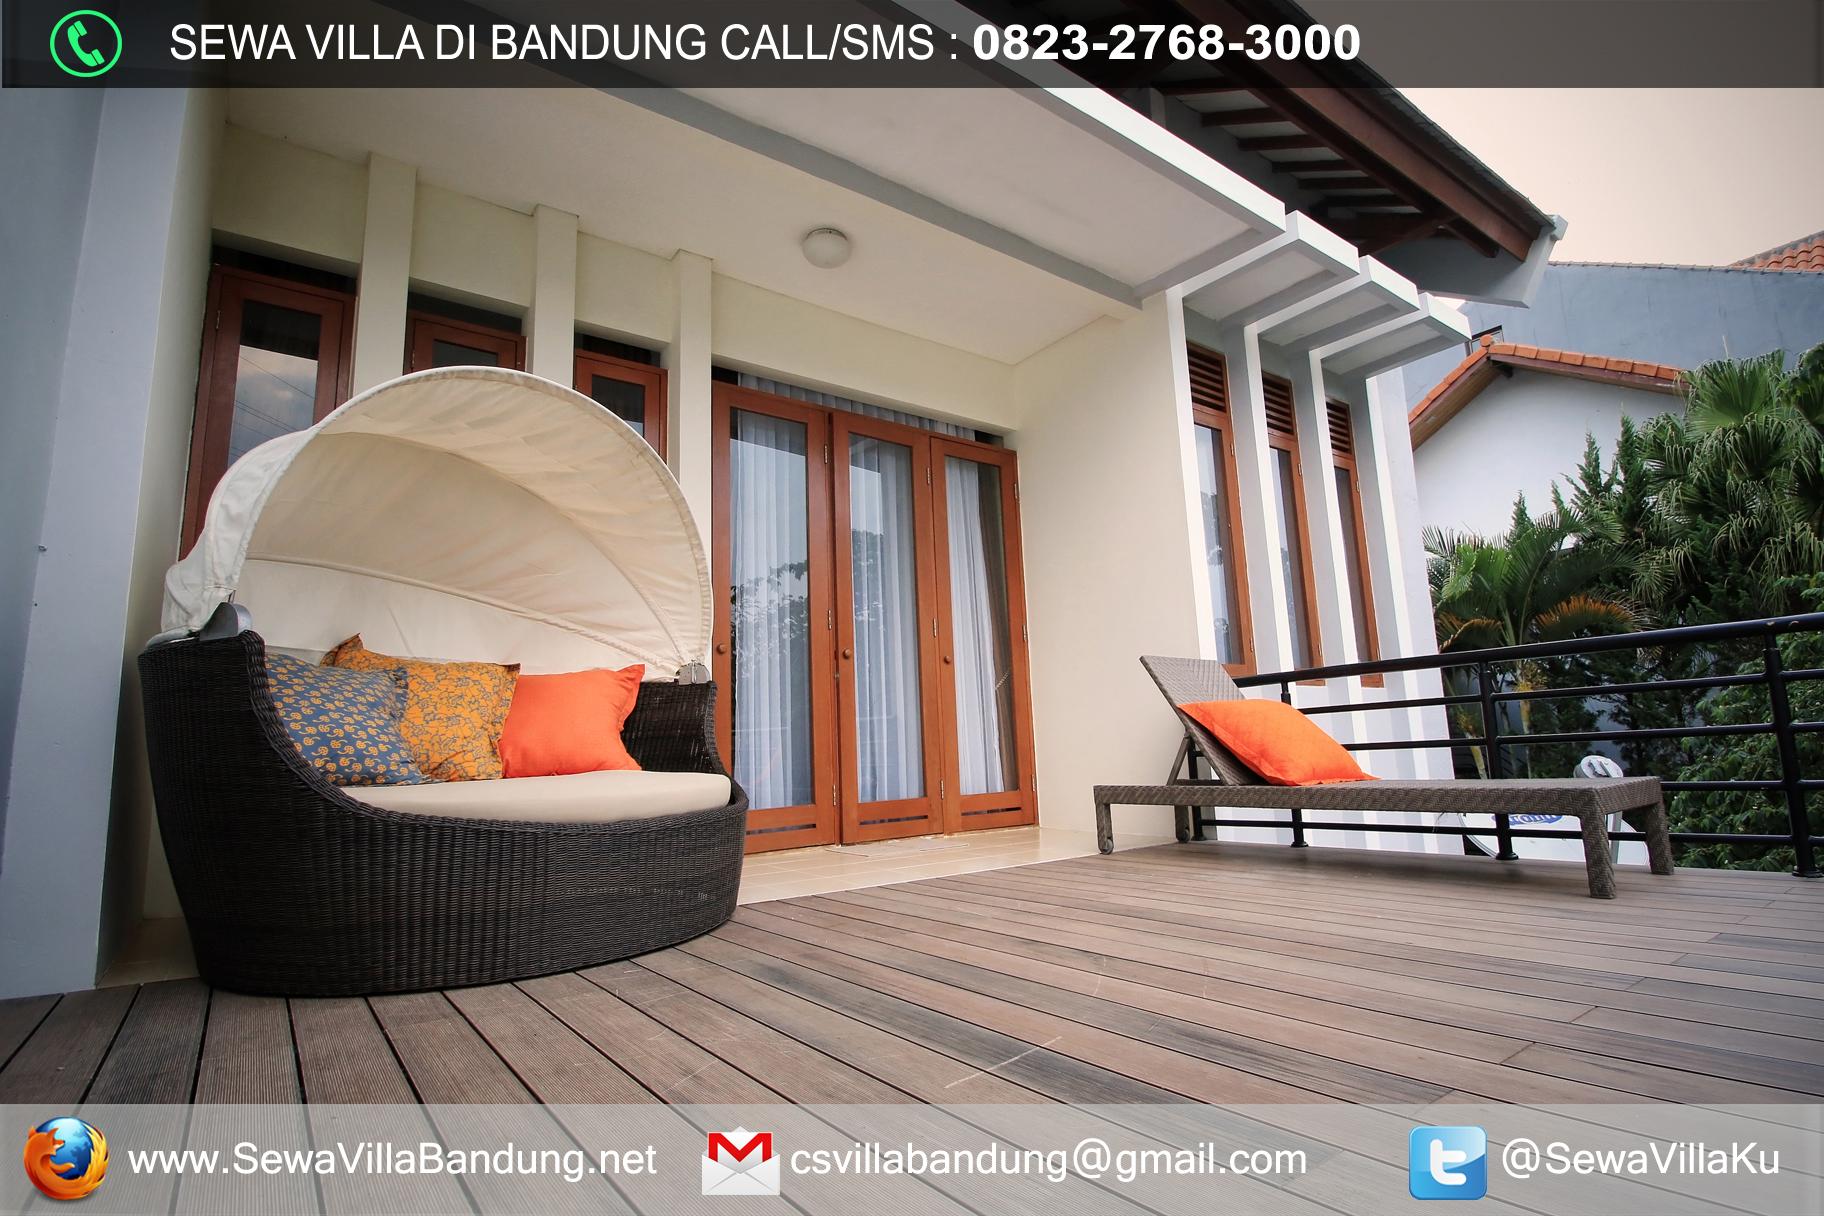 Sewa Villa Di Bandung | Sewa Villa di Bandung Lembang ...